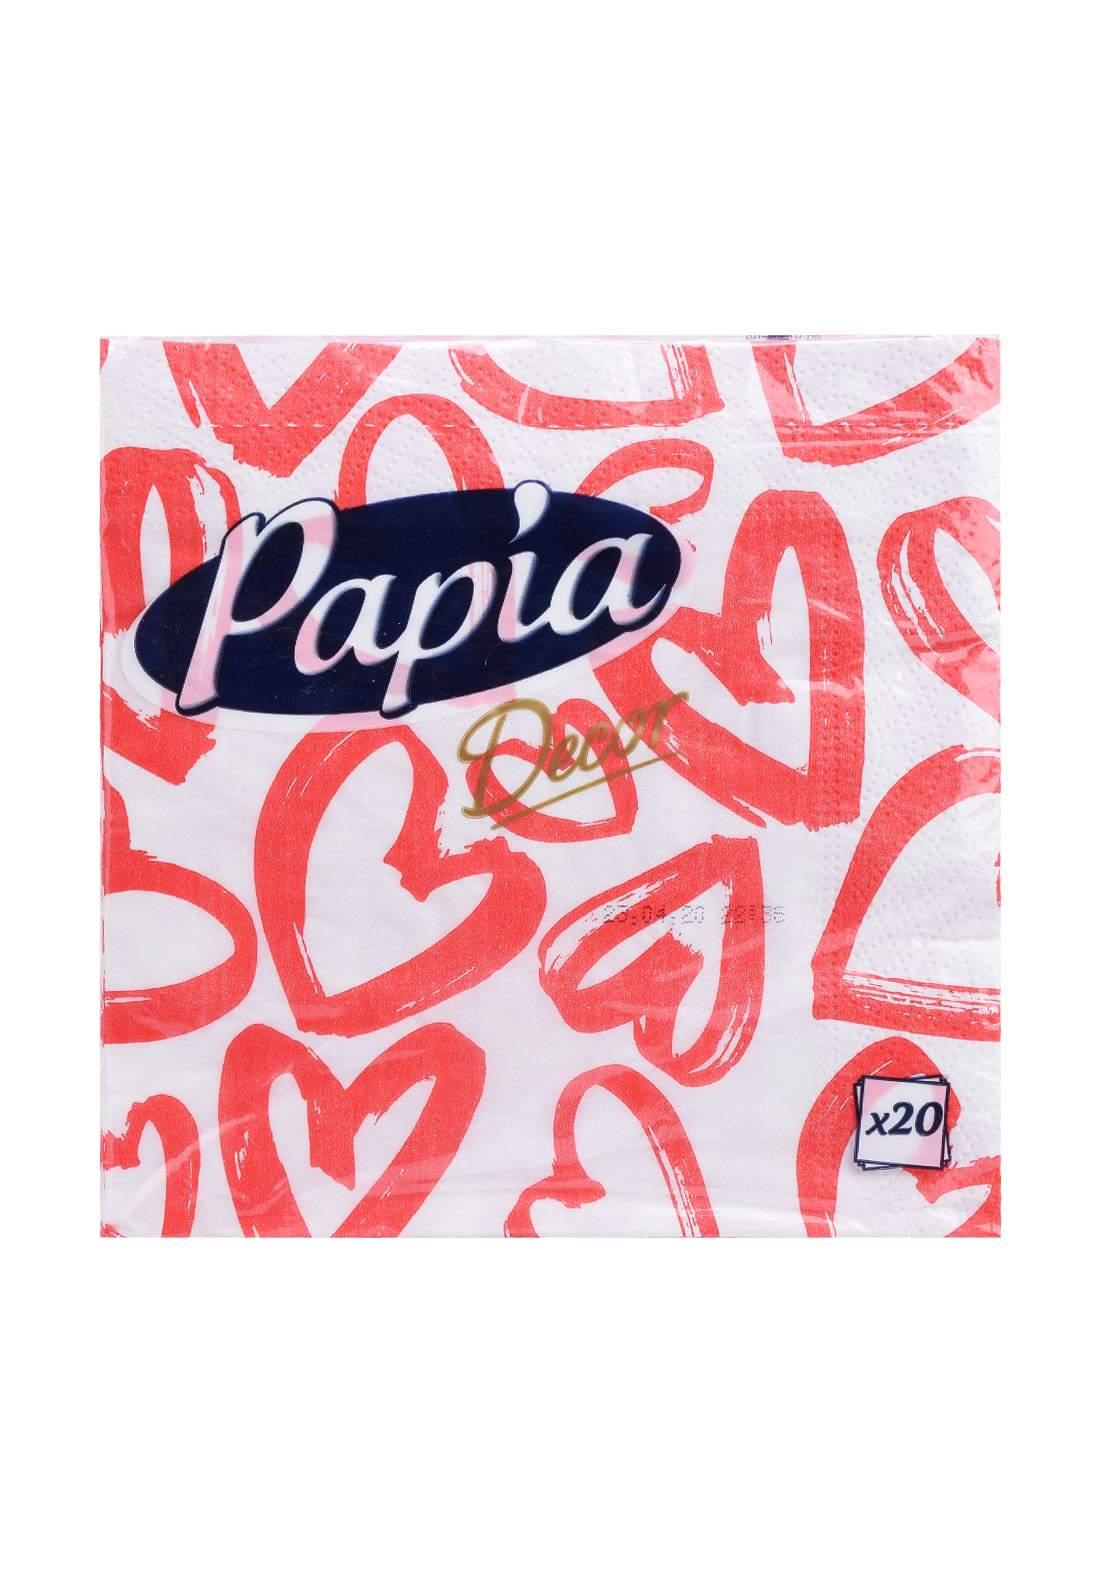 Papia Table 20 Sheets مناديل ورقية